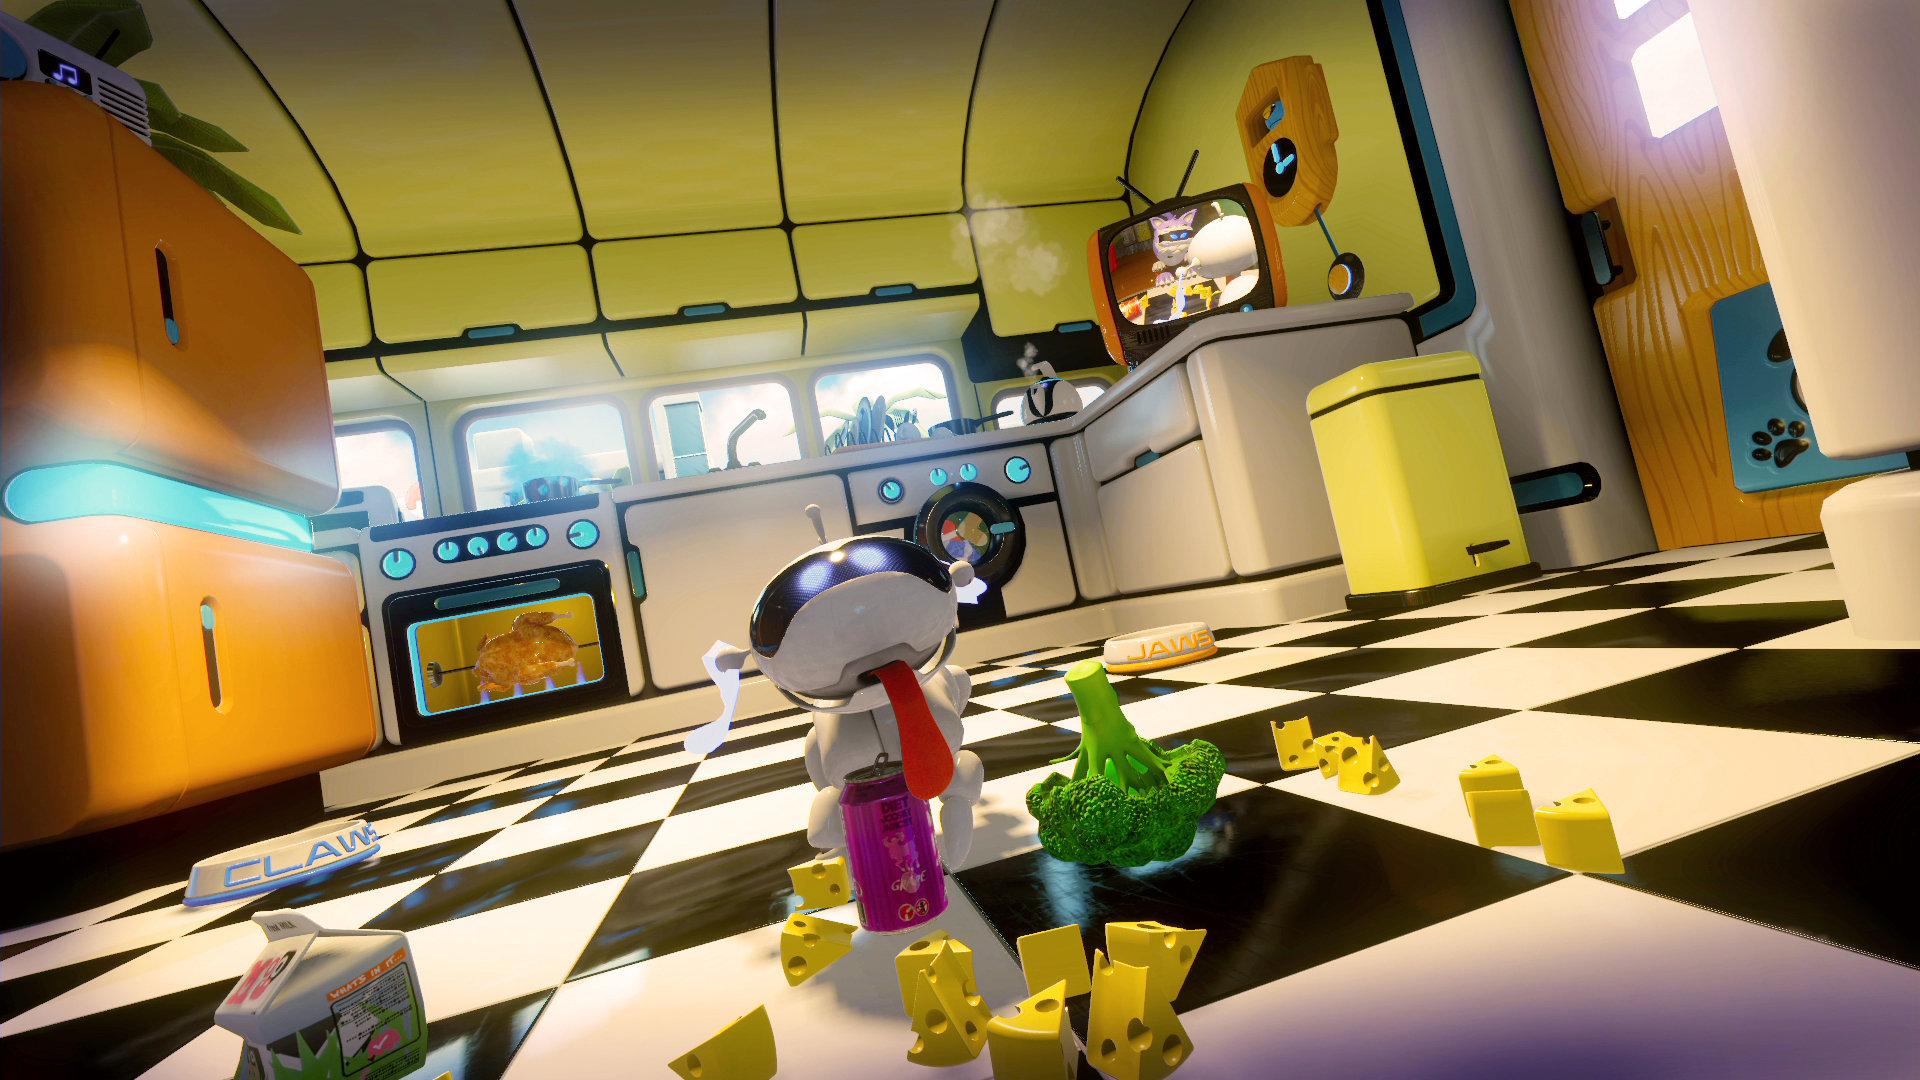 THE PLAYROOM VR Game | PS4 - PlayStation